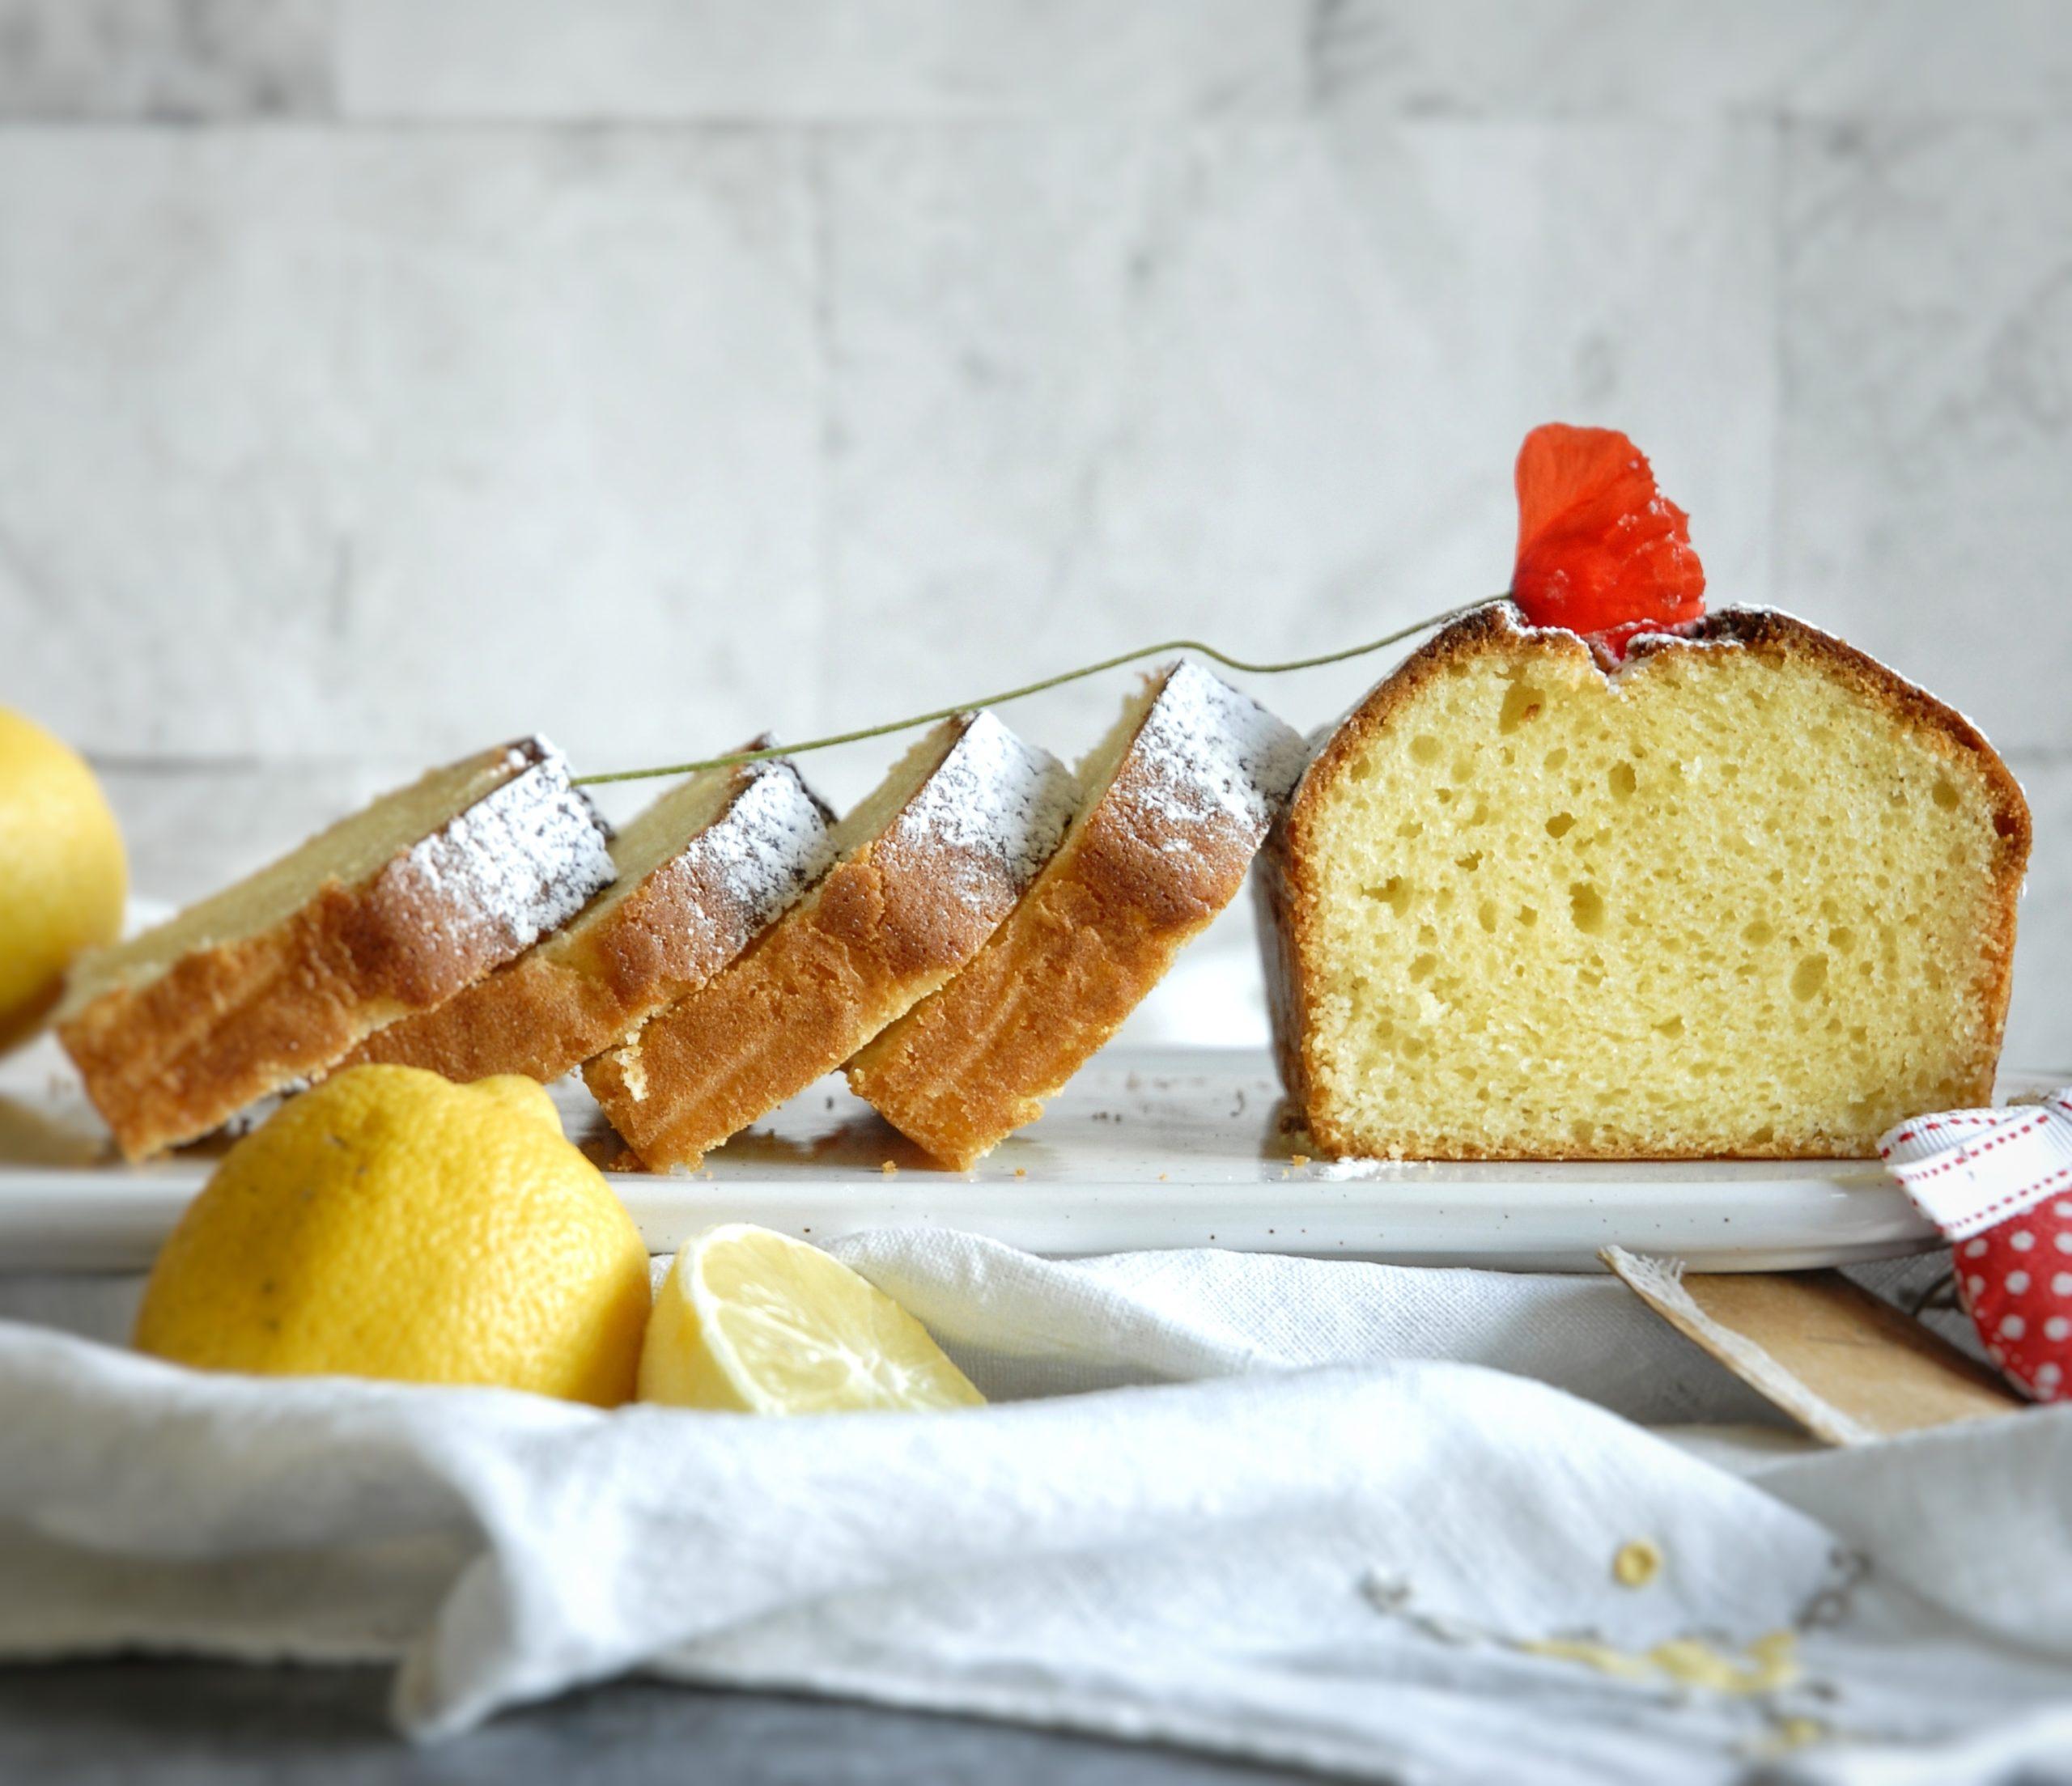 Plumcake al limone con yogurt